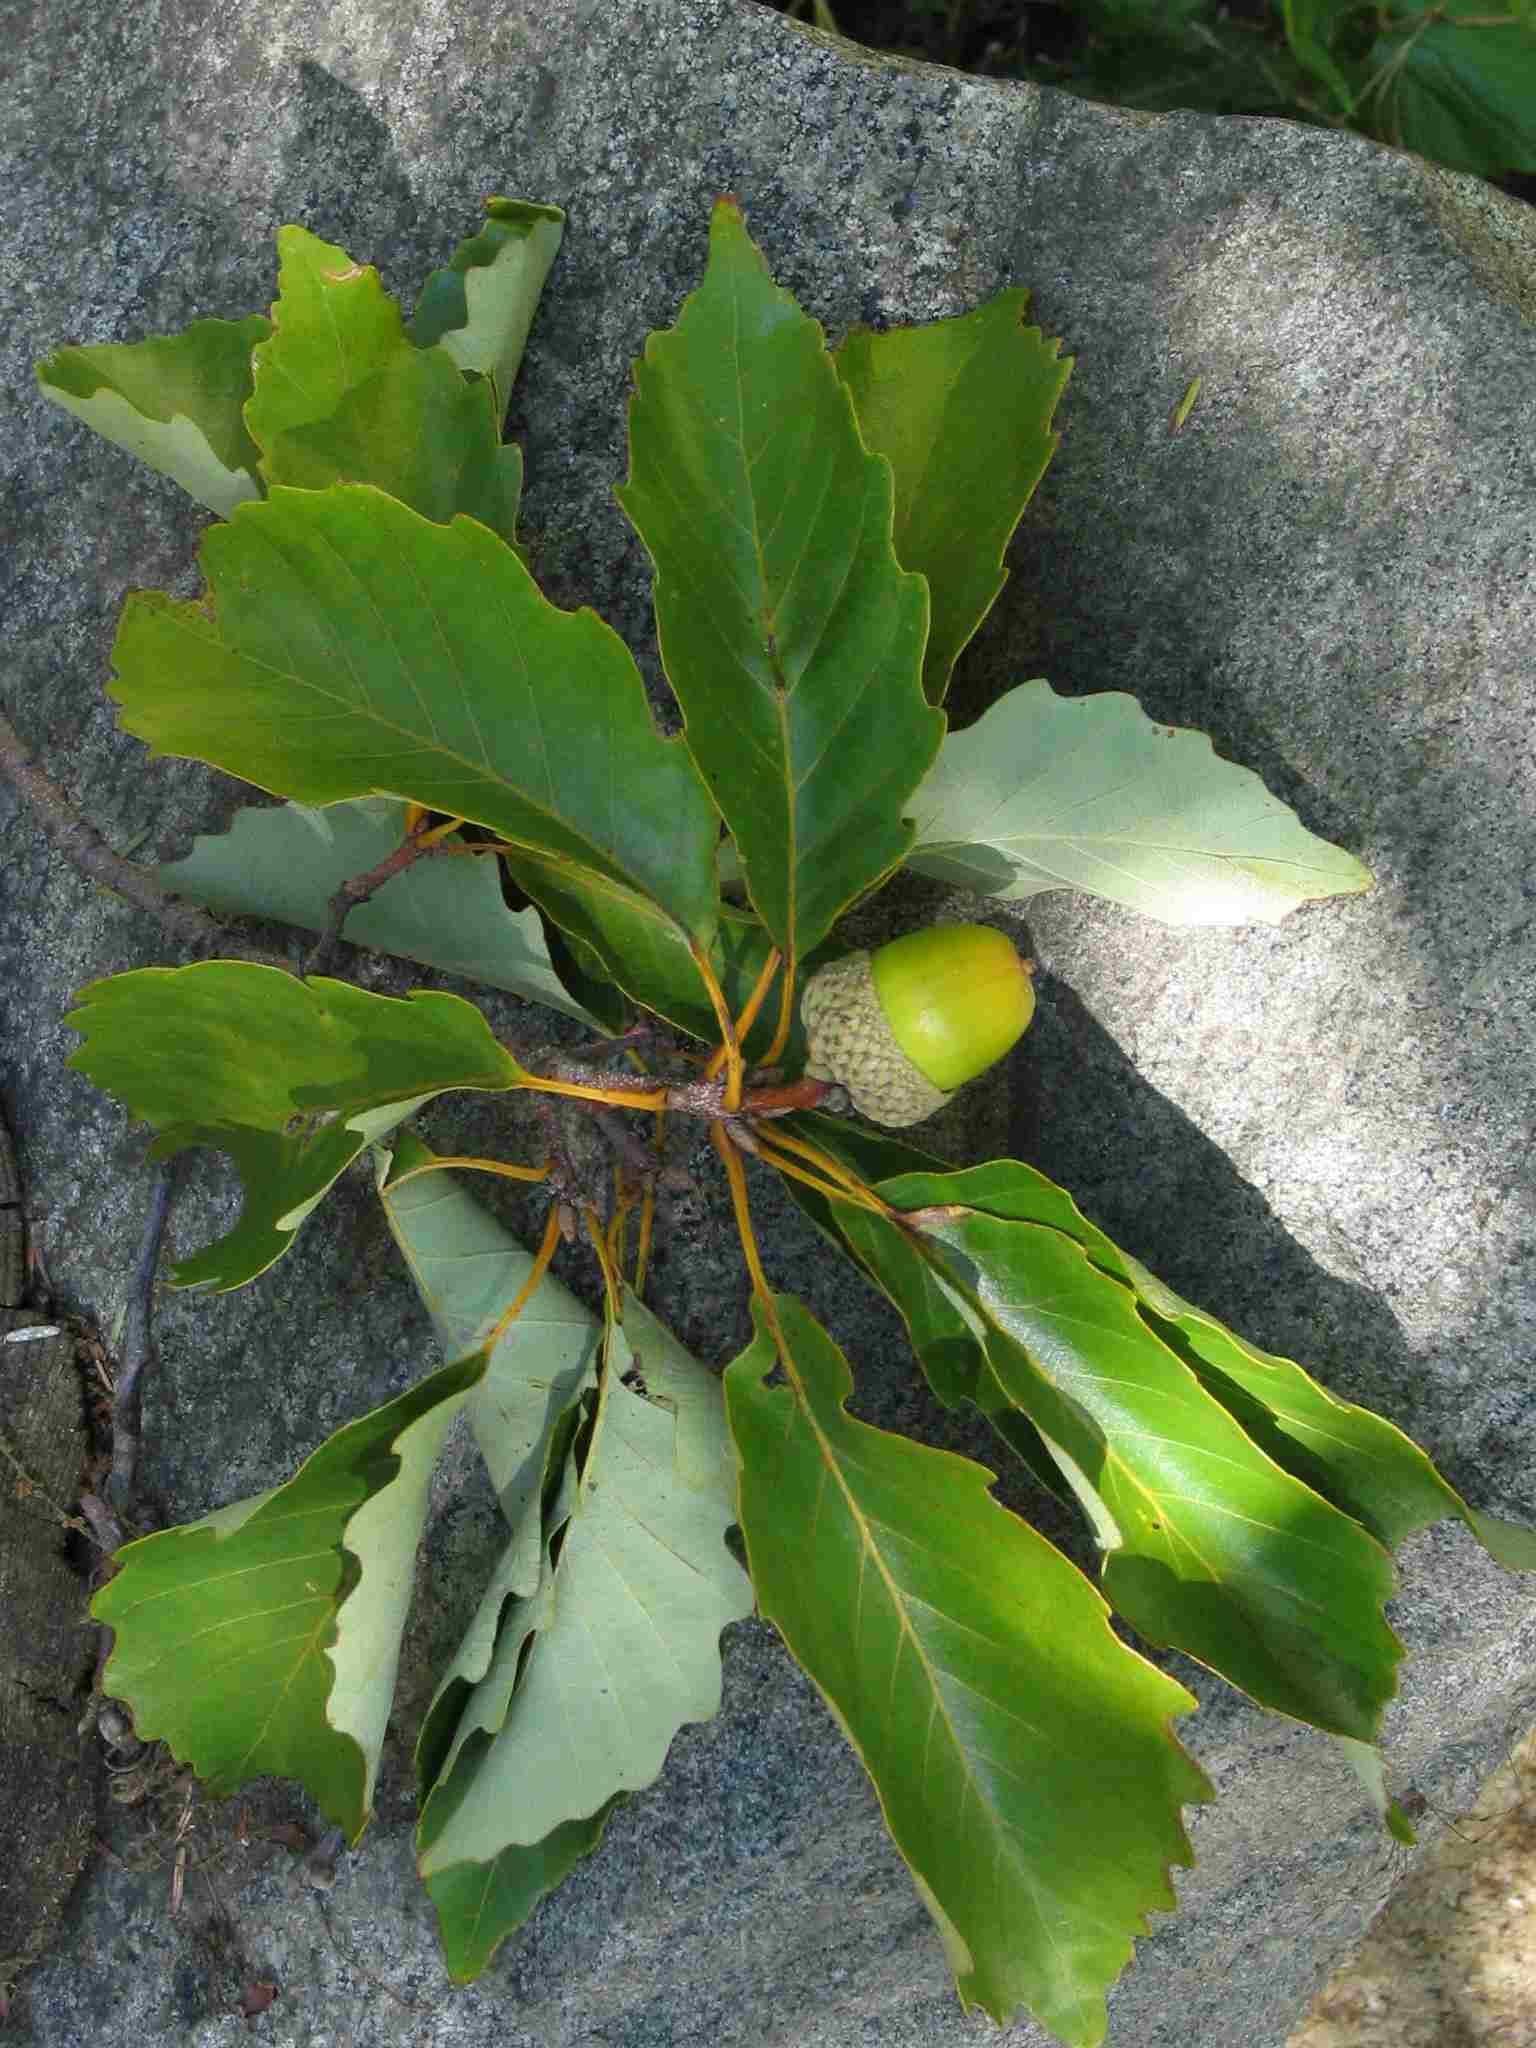 chestnut oak leaves and acorn